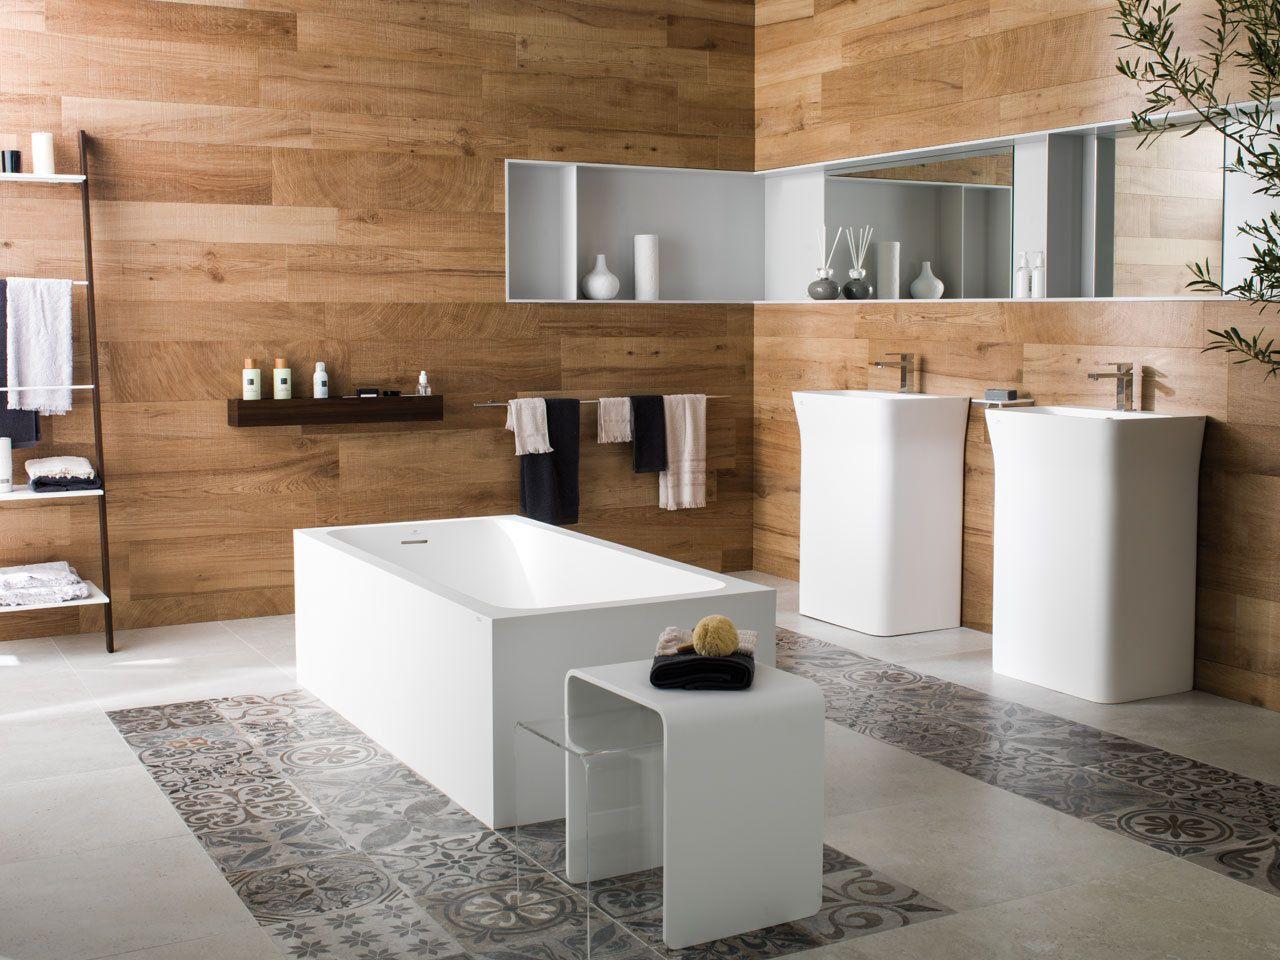 Porcelanosa ascot teca wood effect porcelain tiles 158m2 porcelain matt modern floor wall tiles ebay dailygadgetfo Image collections